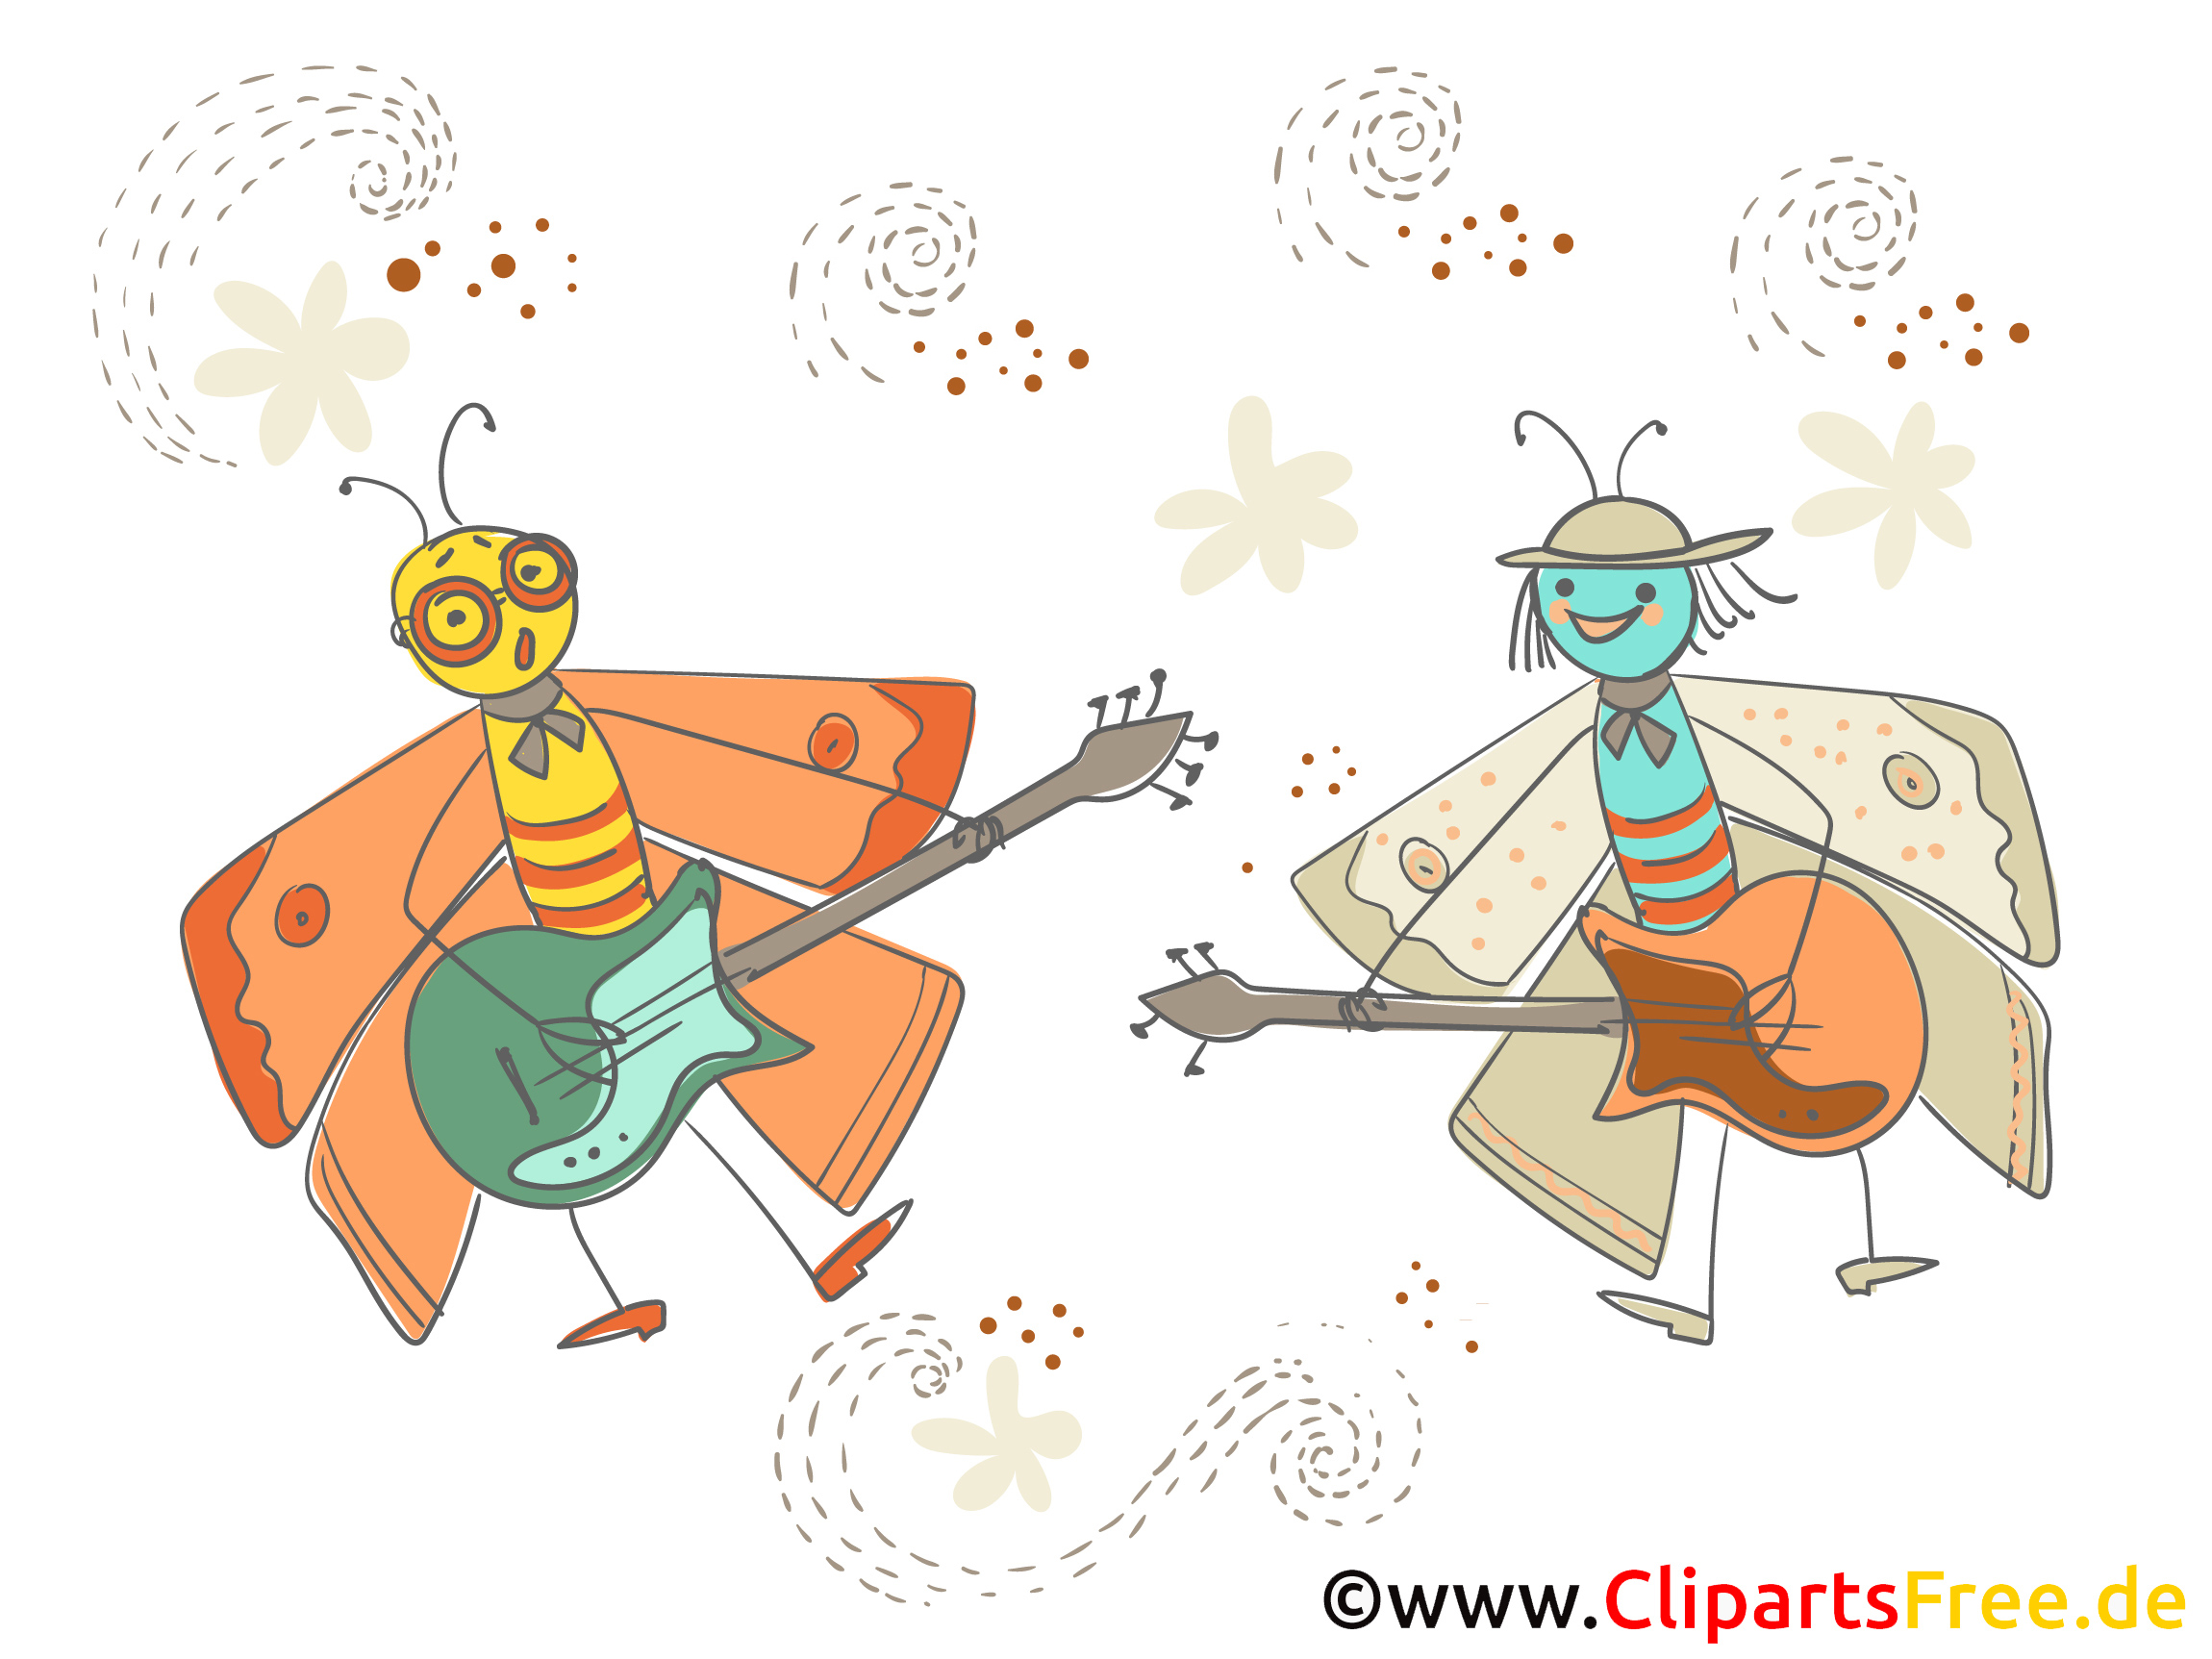 Karneval Bild lustige Motten mit Gitarren